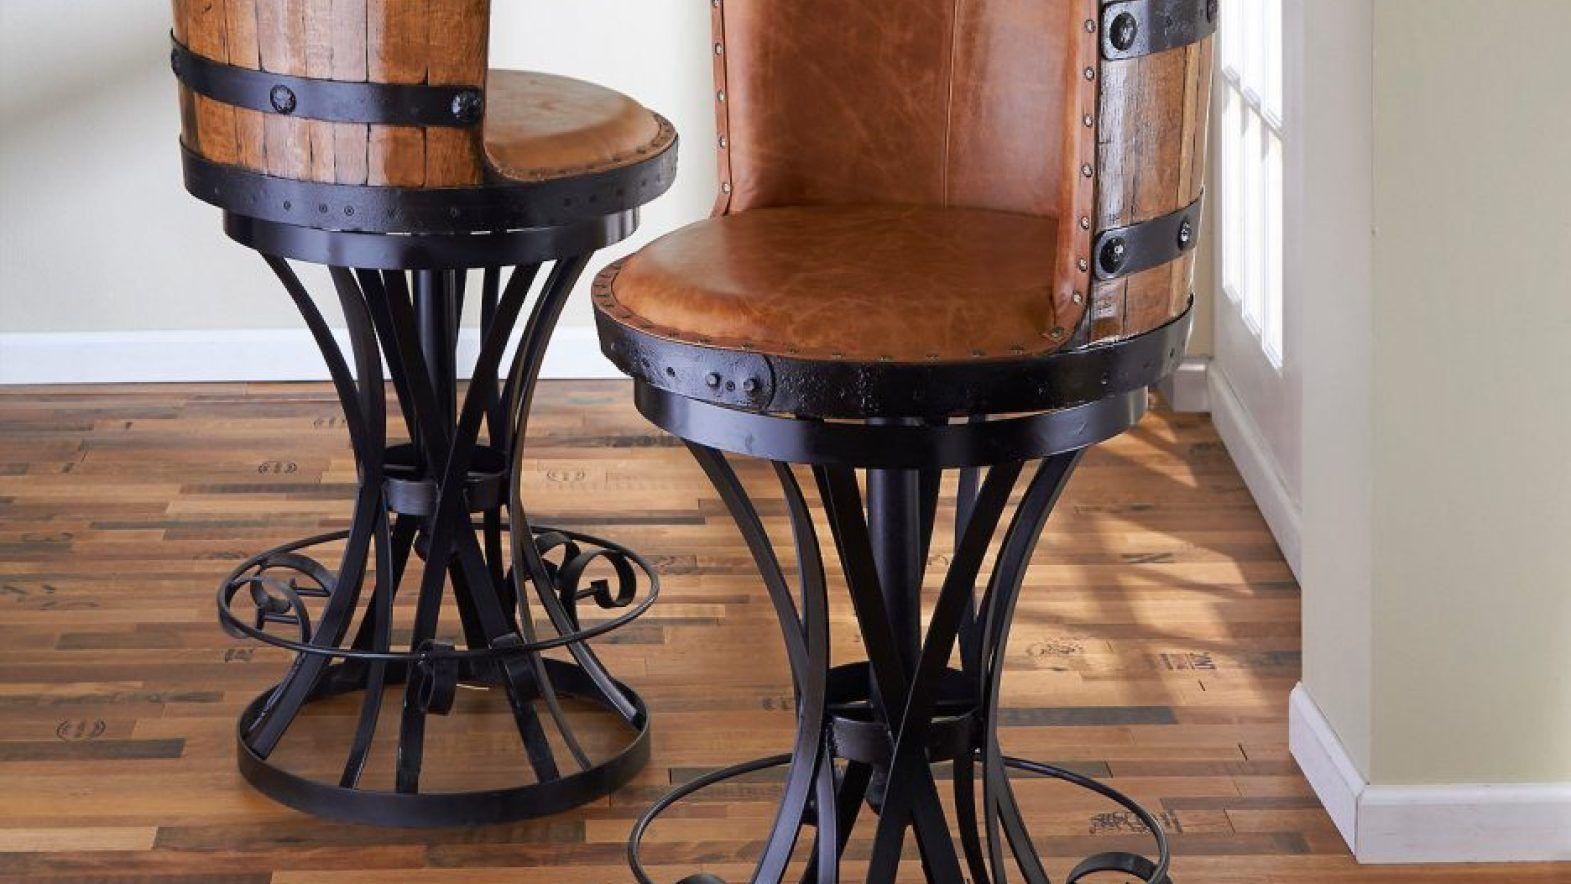 Adjustable Outdoor Bar Stools Barhocker Hausbar Mobel Und